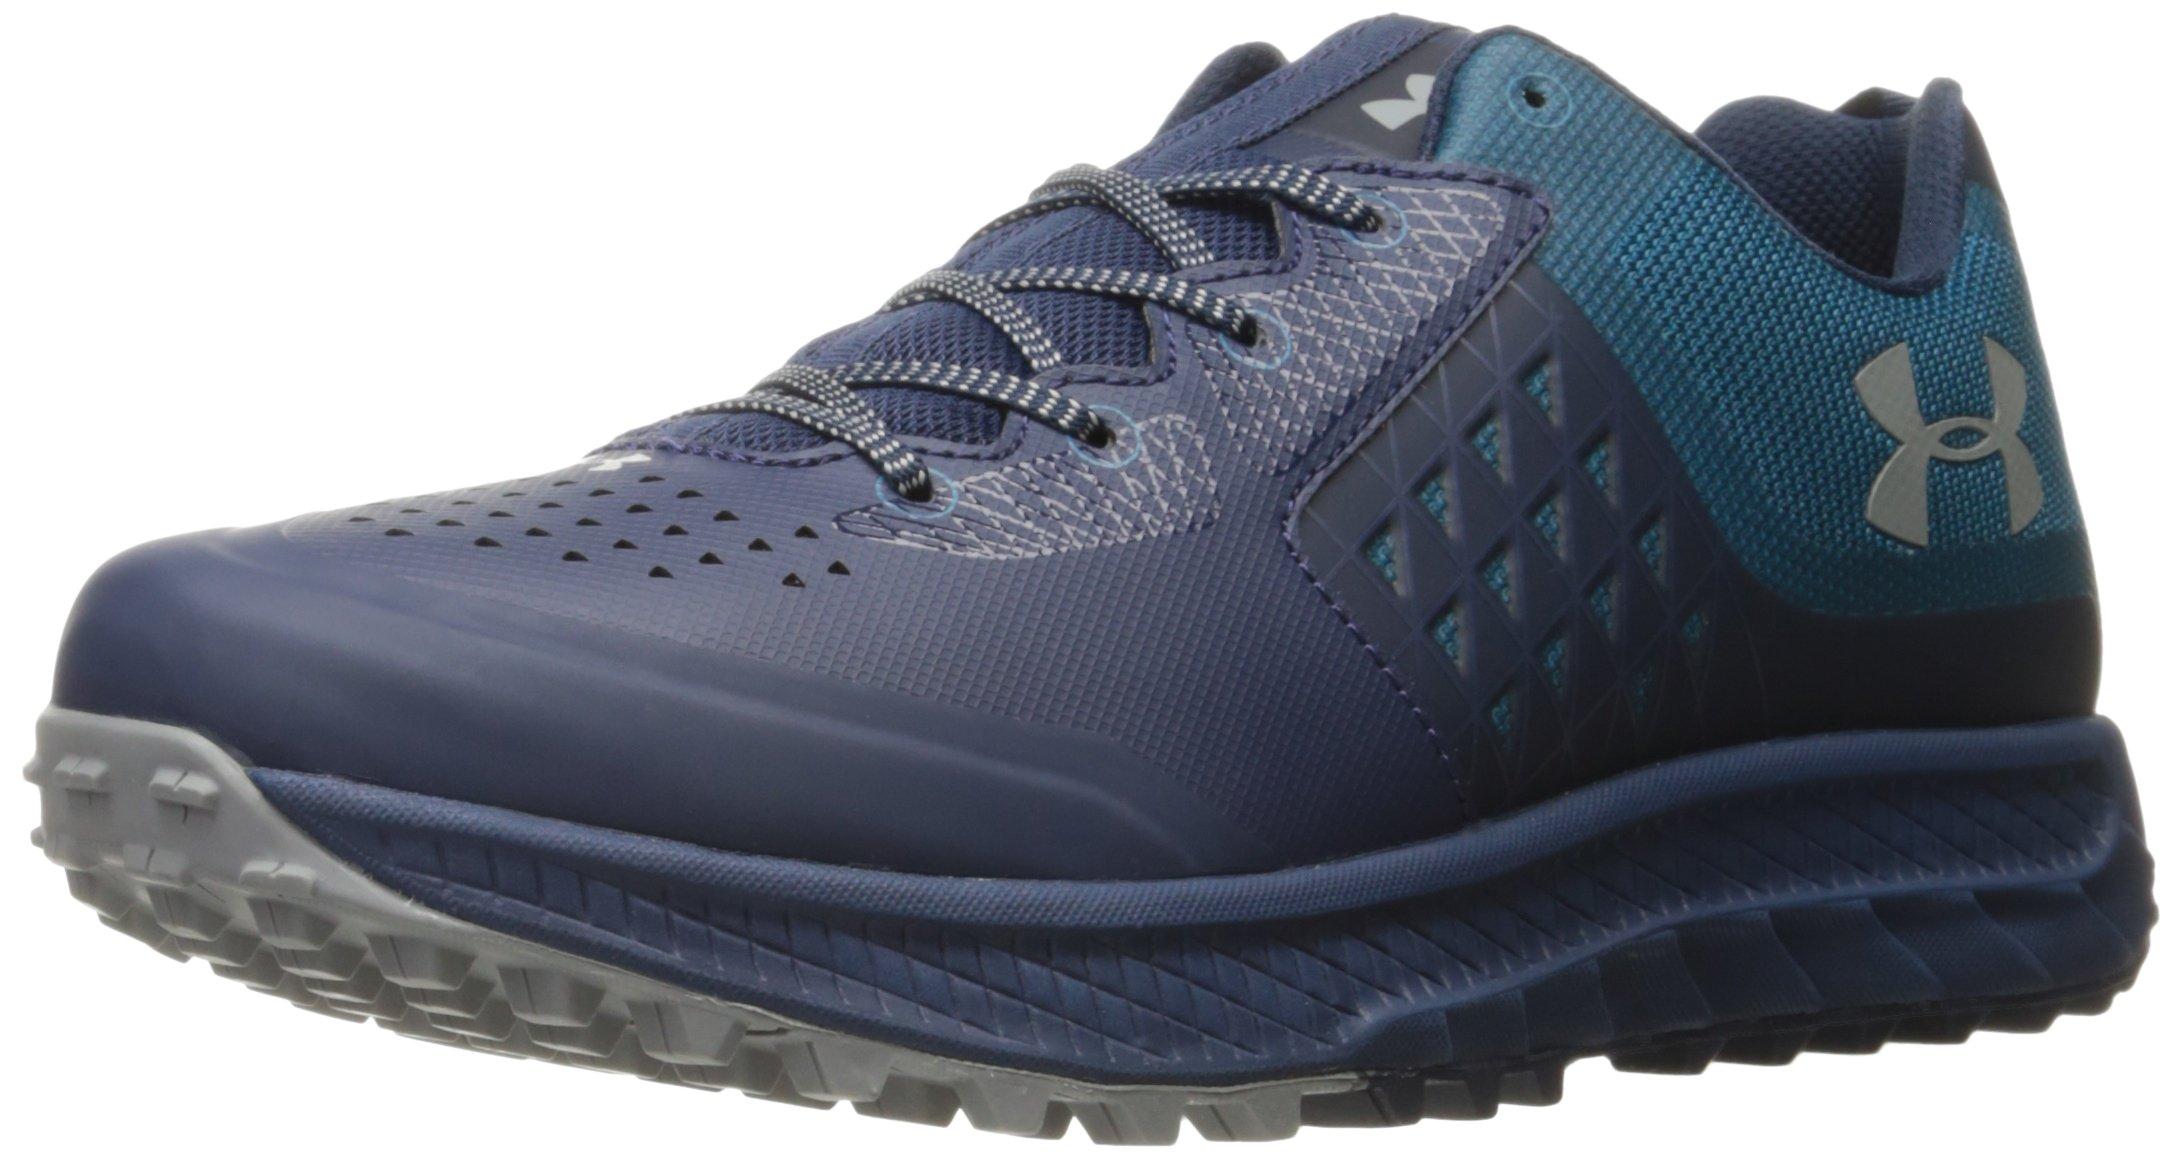 Under Armour Men's Horizon Str Ankle Boot, Academy (408)/Bayou Blue, 13